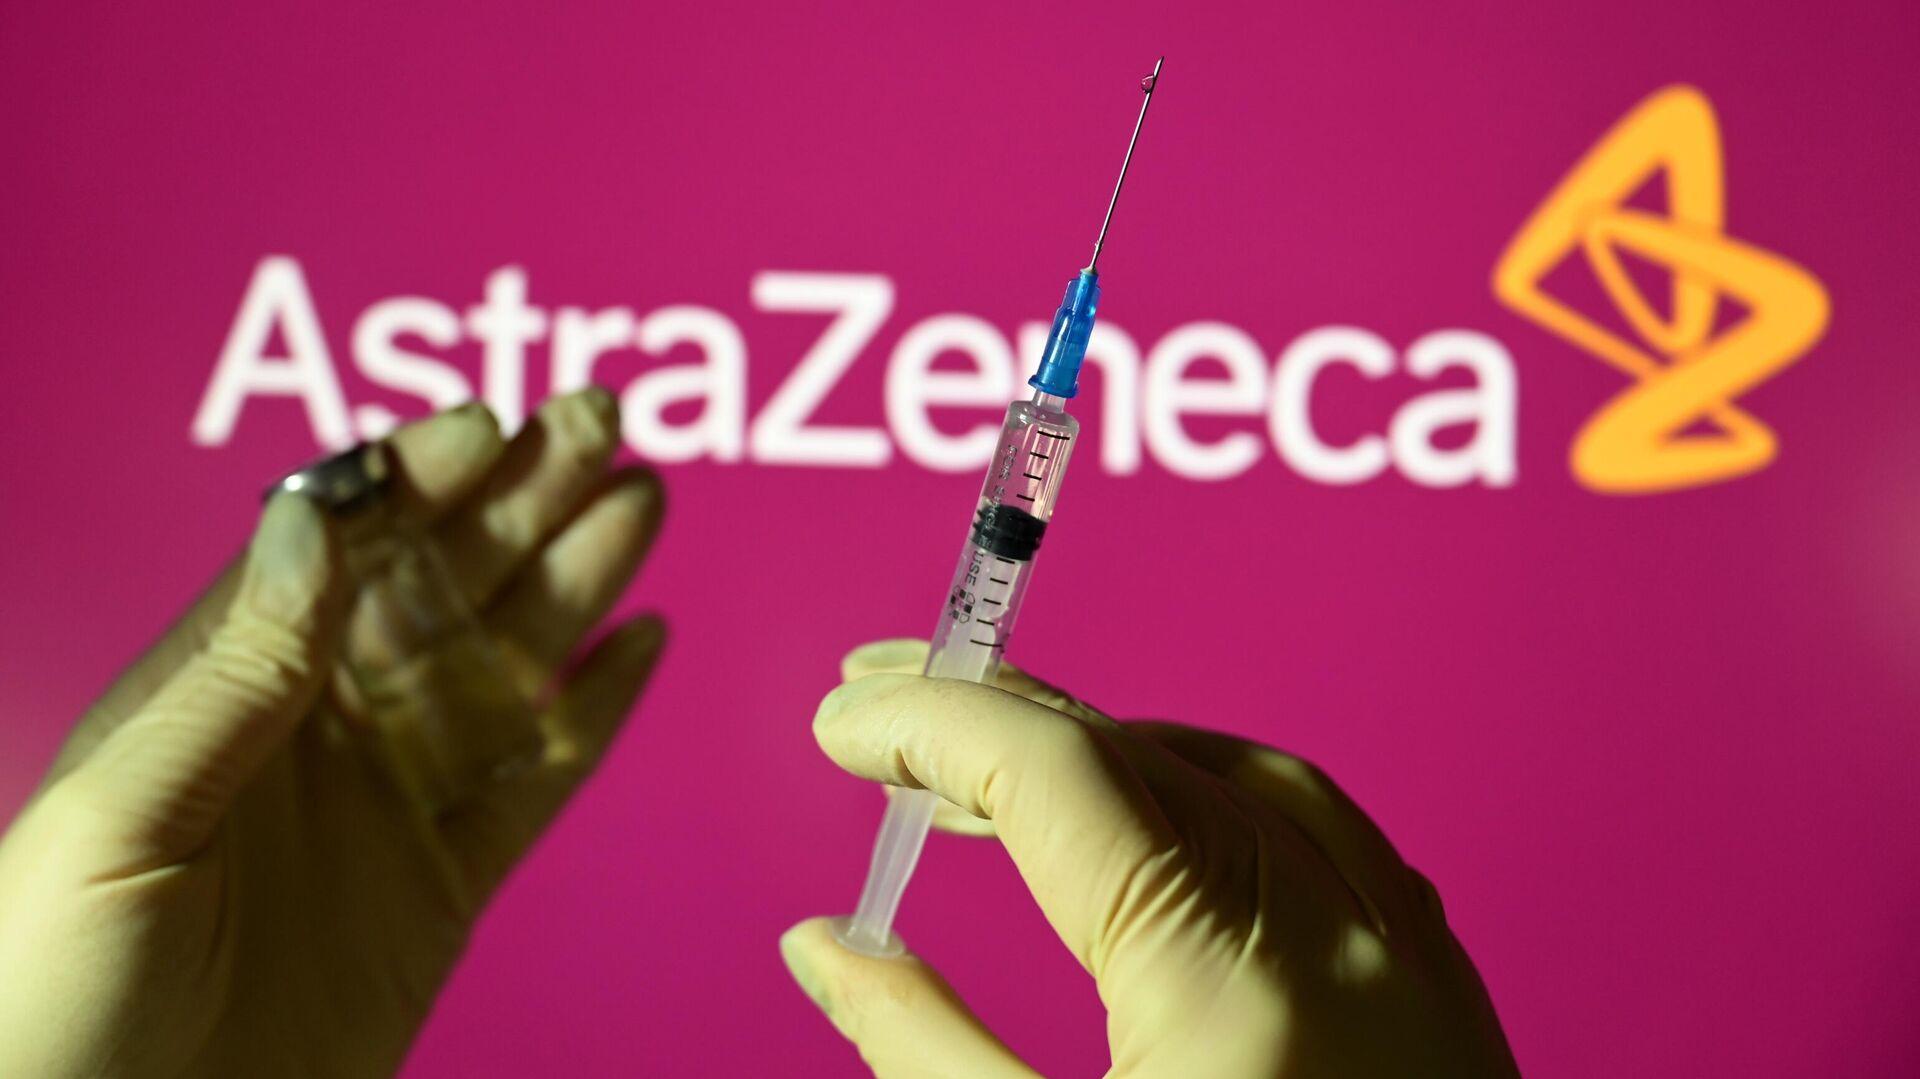 AstraZeneca-Impfstoff gegen Corona (Symbolfoto) - SNA, 1920, 27.05.2021